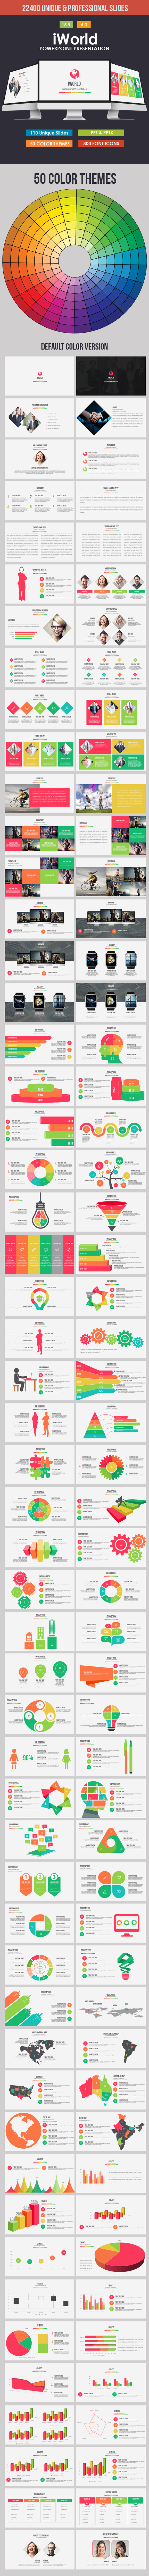 iWorld - Powerpoint Presentation Template - Business PowerPoint Templates